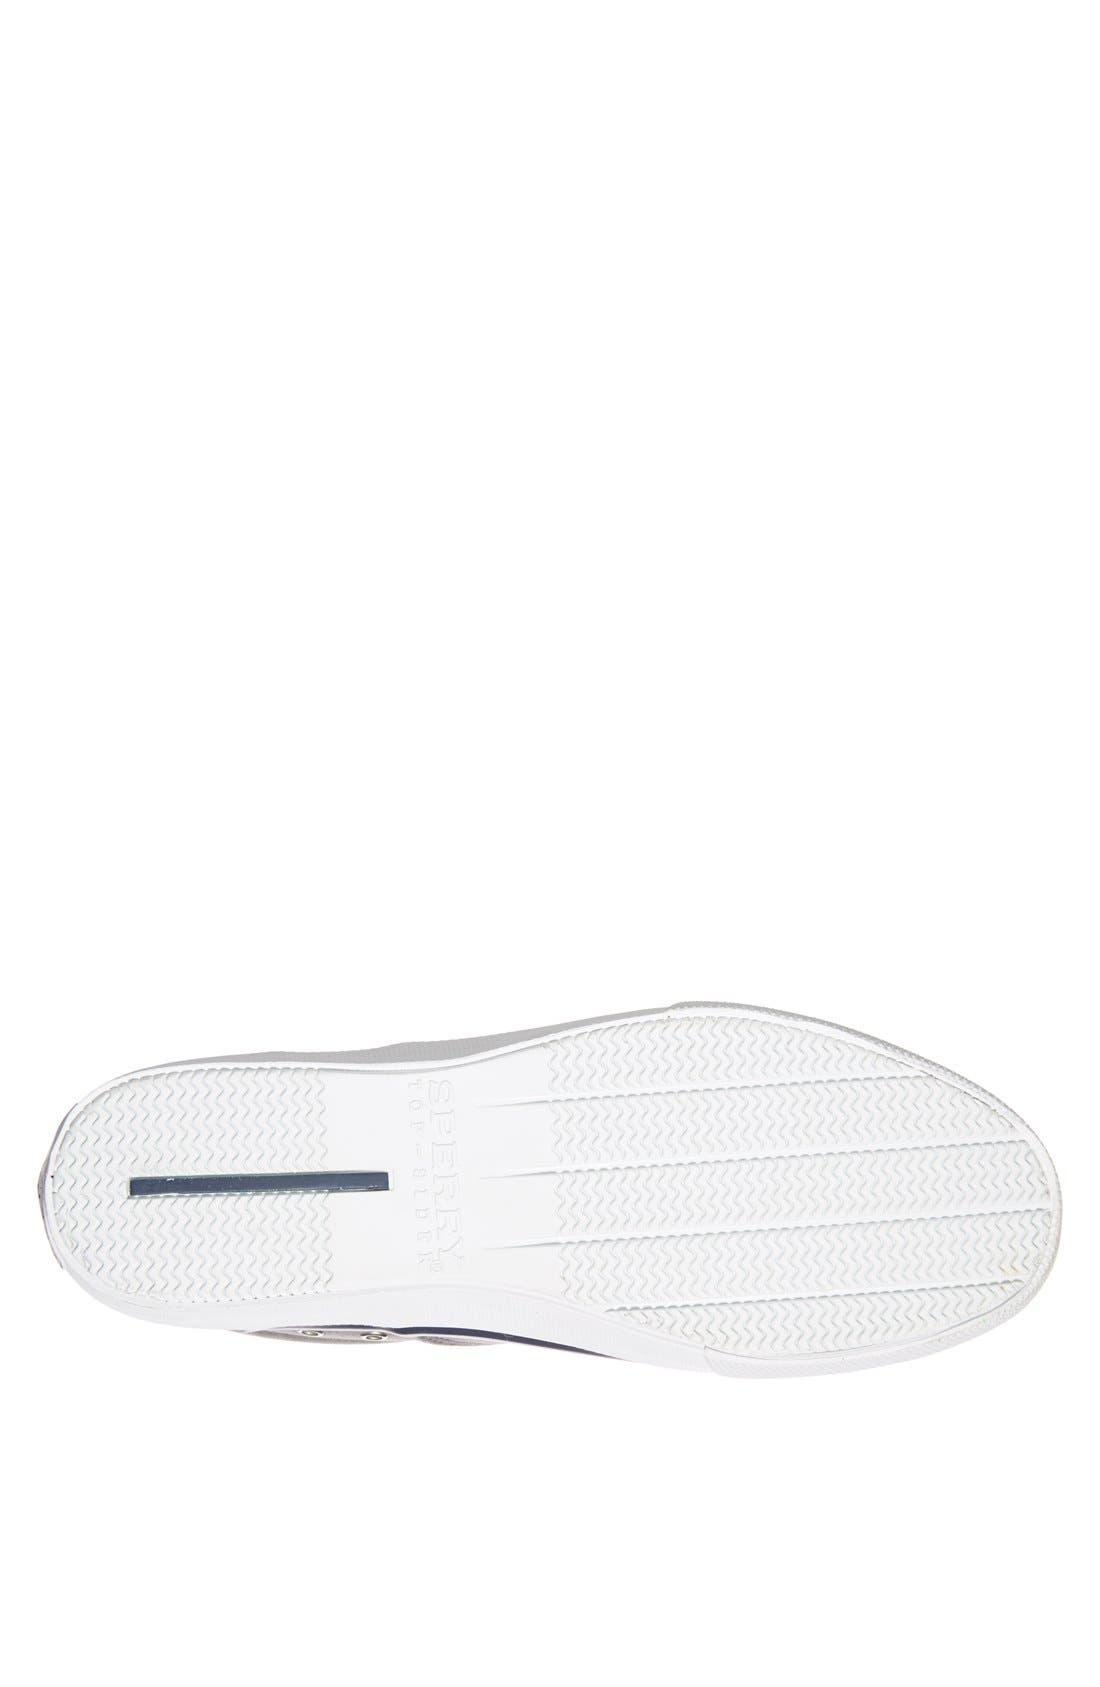 'Striper CVO' Sneaker,                             Alternate thumbnail 8, color,